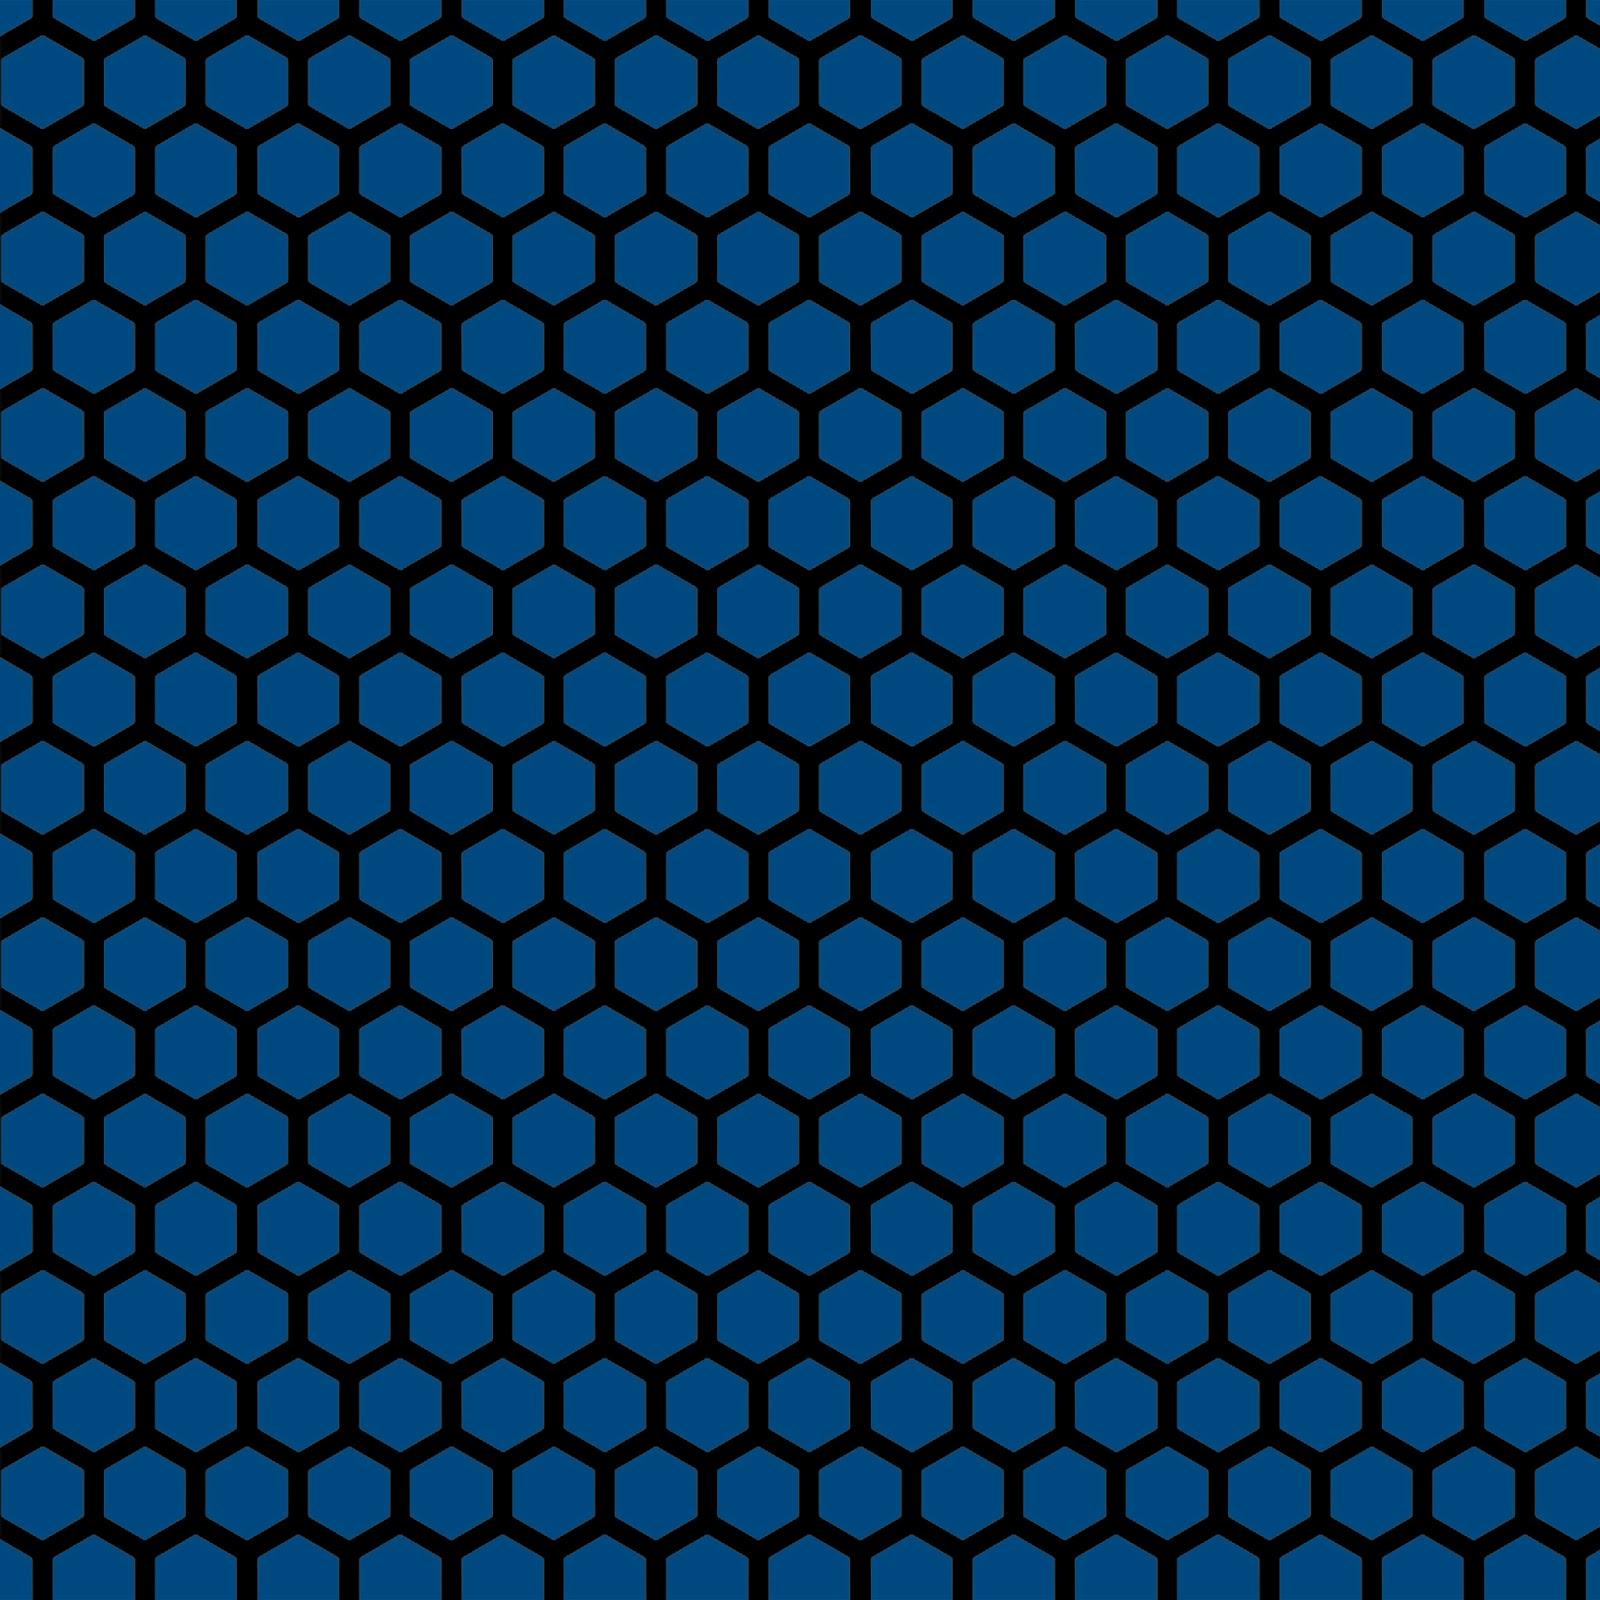 Hexagon Wallpapers - WallpaperSafari